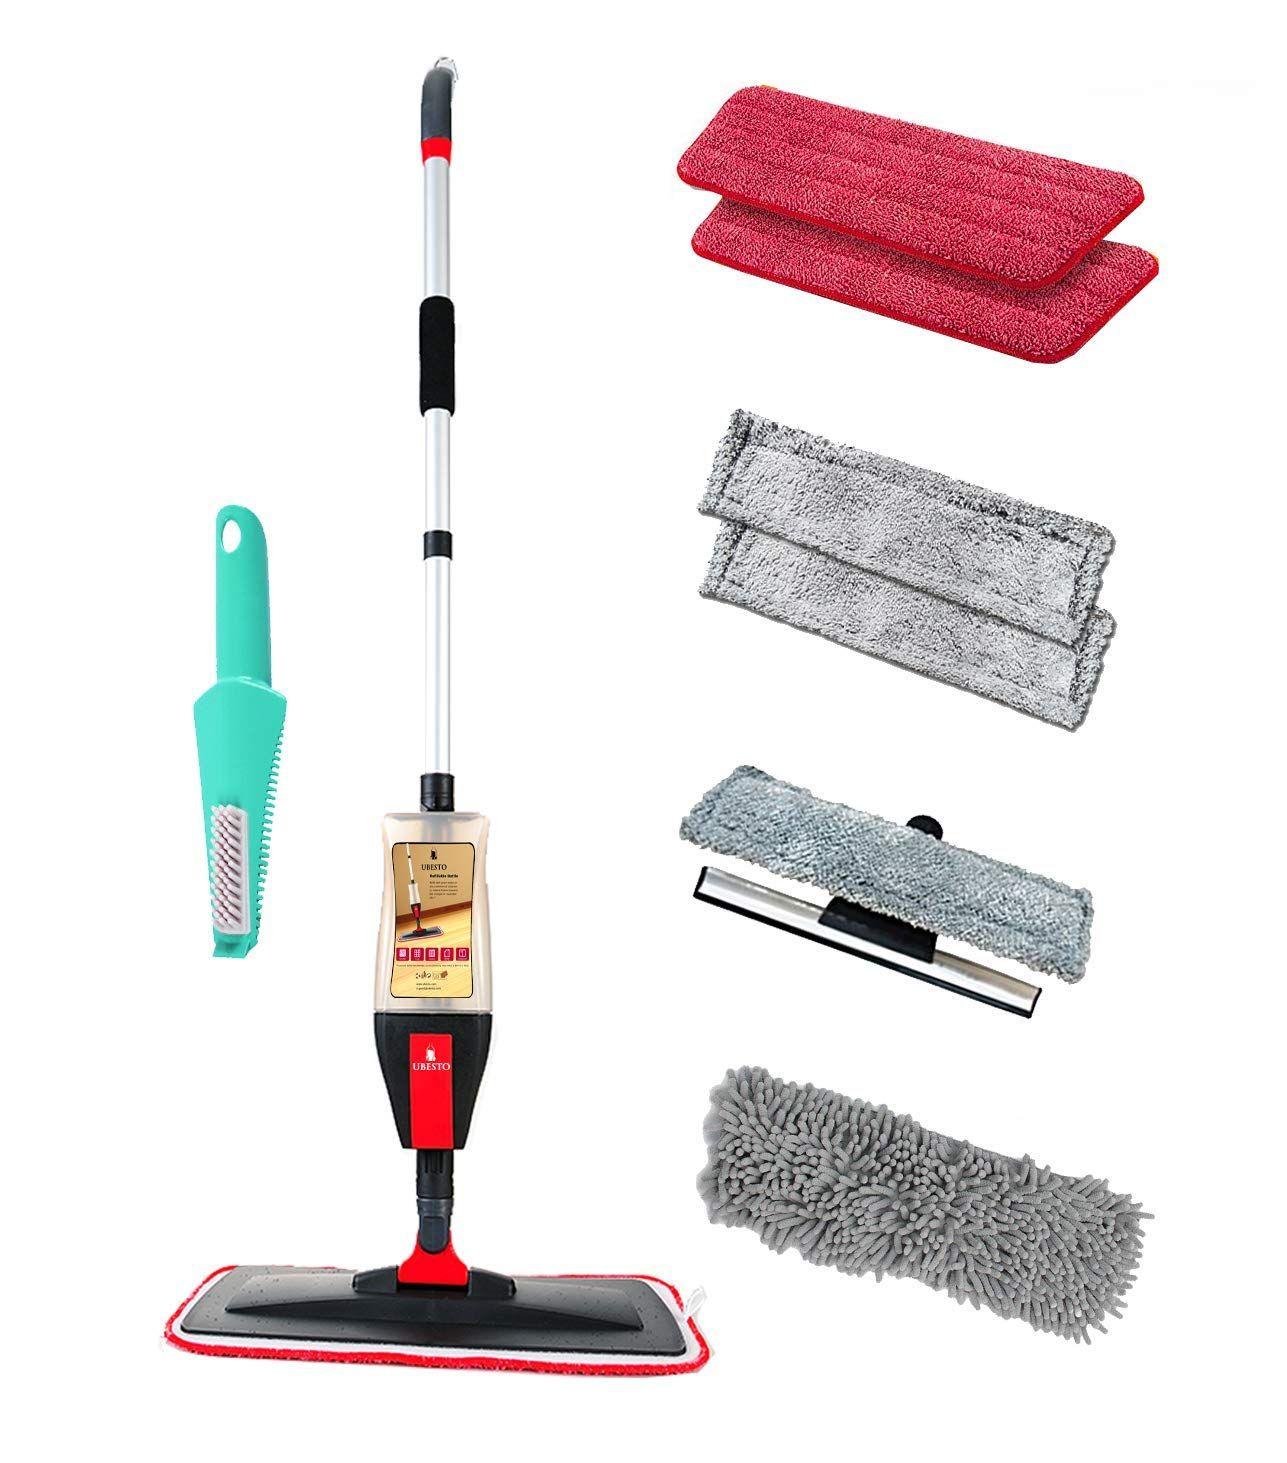 Spray Mop Kit With 4 In 1 Function Floor Mop Set For Vinyl Hardwood Laminate Marble Tile Floors 7 Accessories 2 M Laminate Flooring Laminate Spray Mops